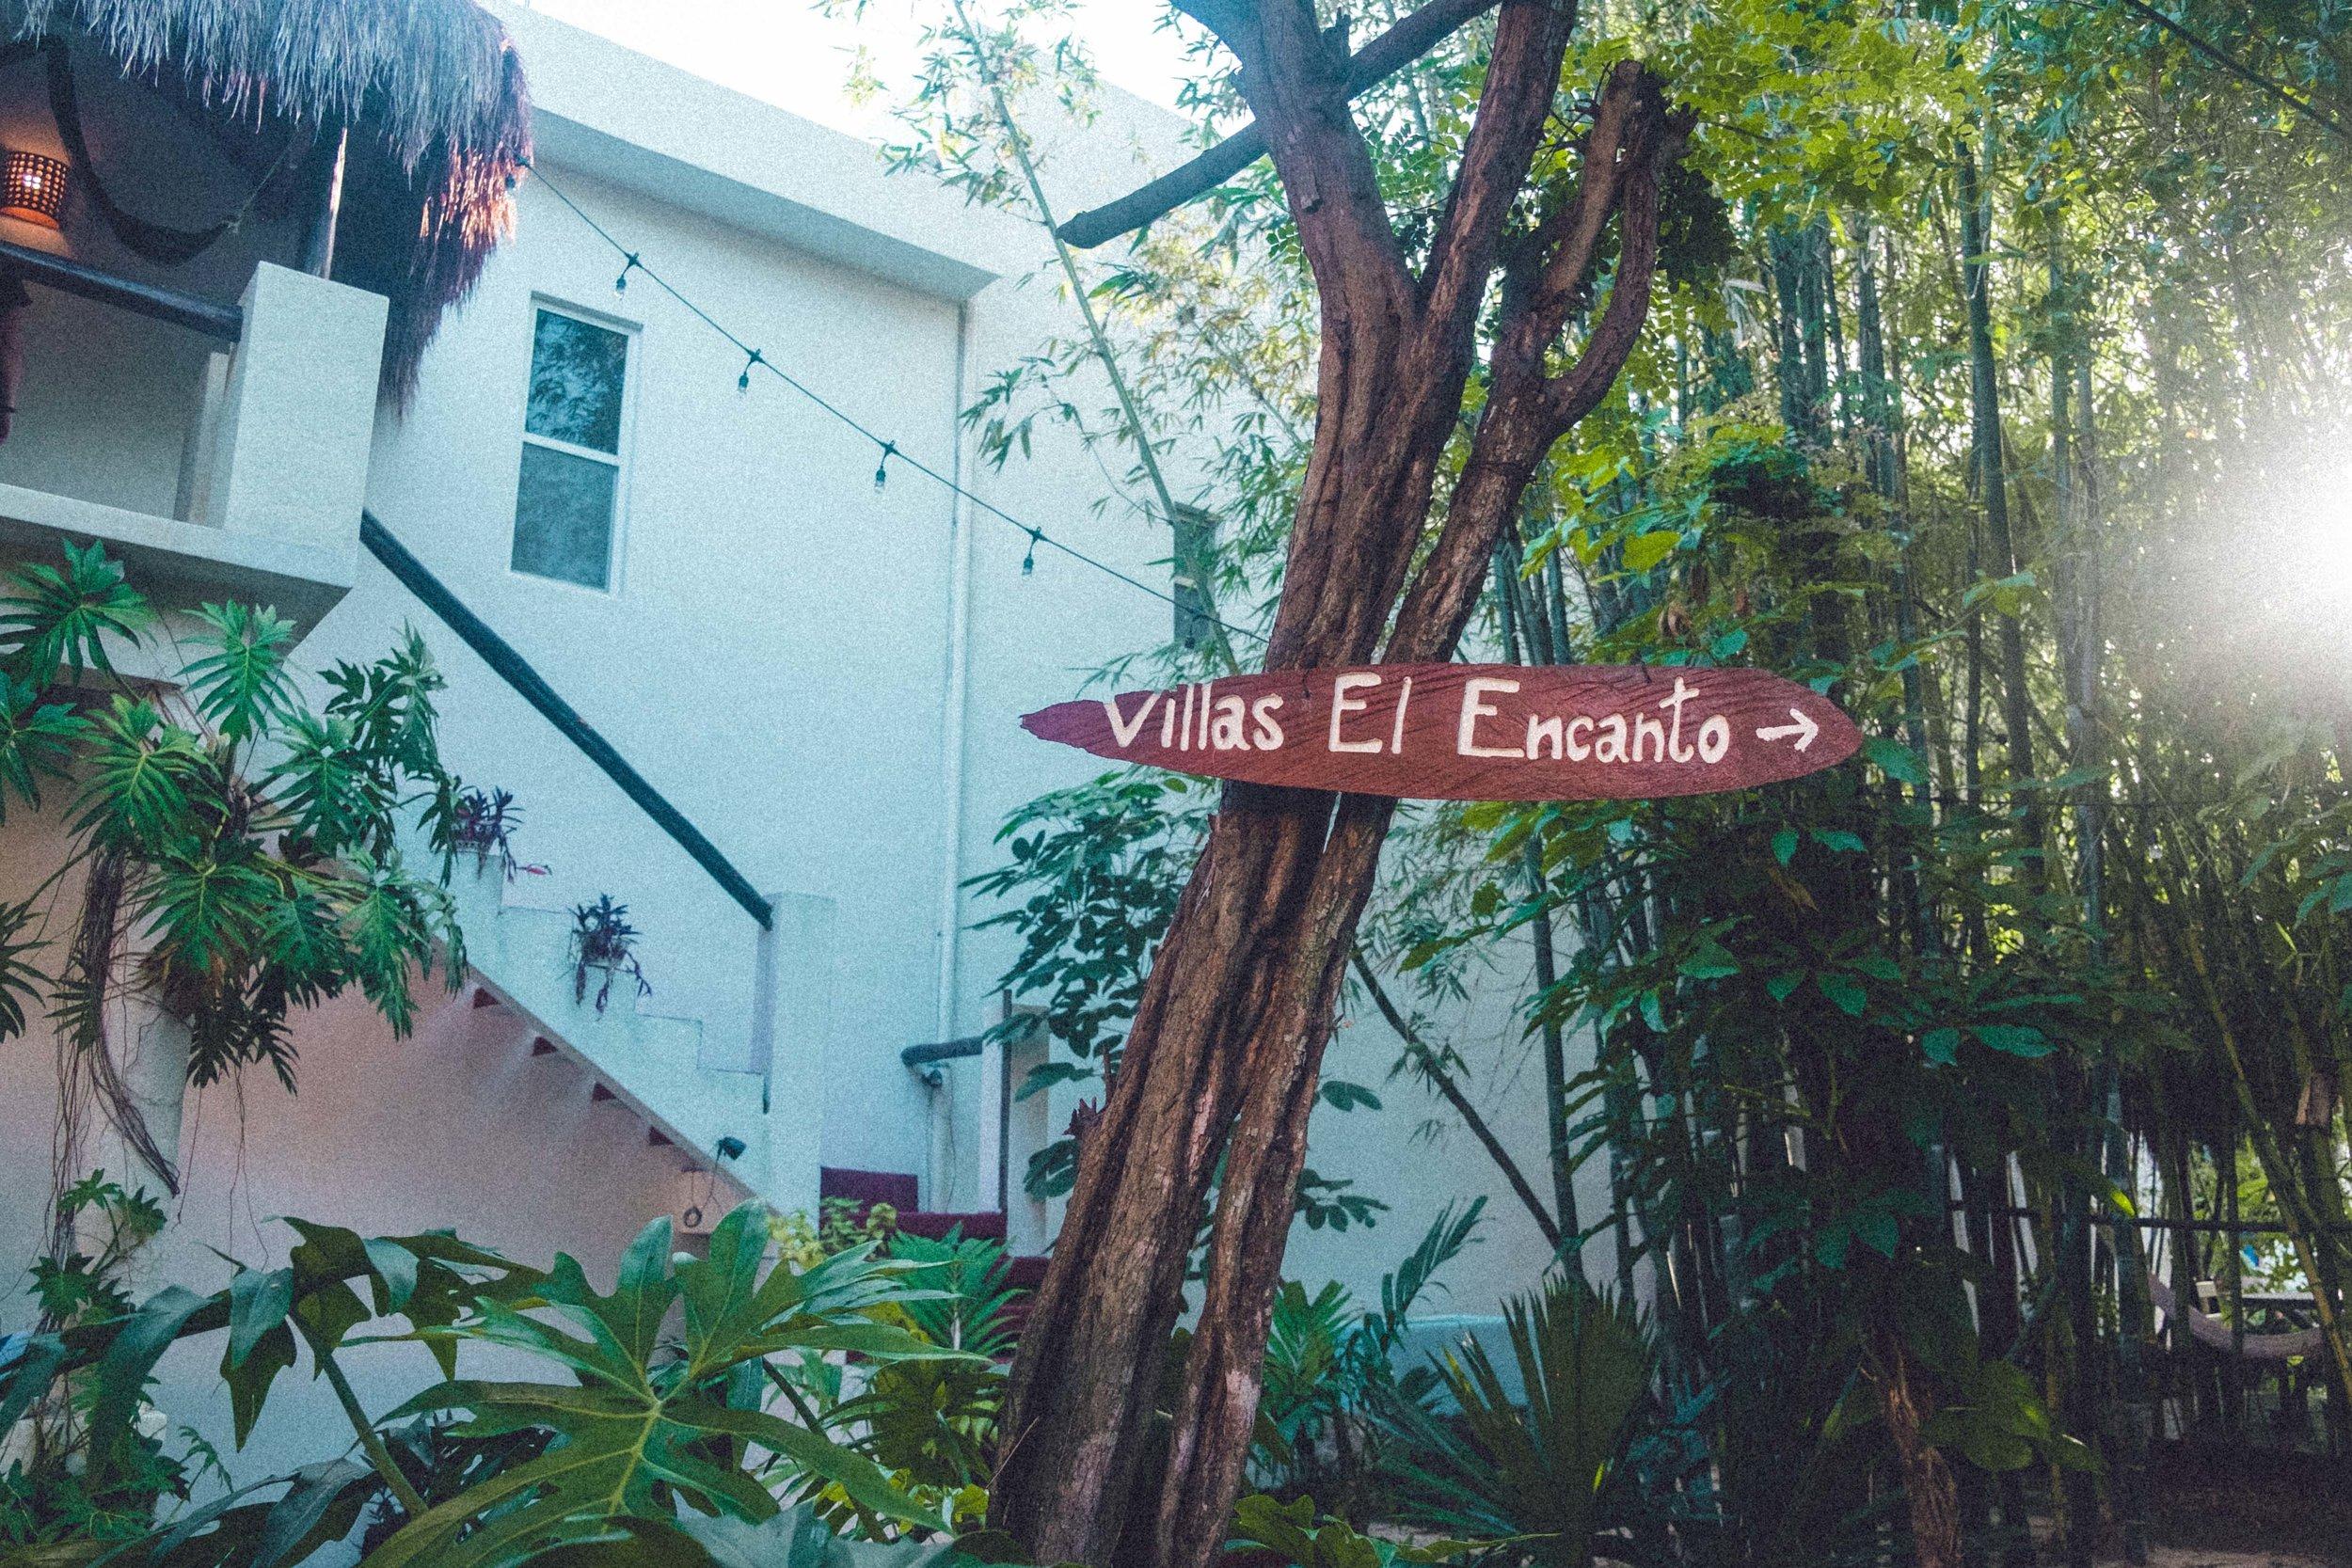 Rachel Off Duty: Where to Stay in Cozumel, Mexico - Villas El Encanto Hotel Review